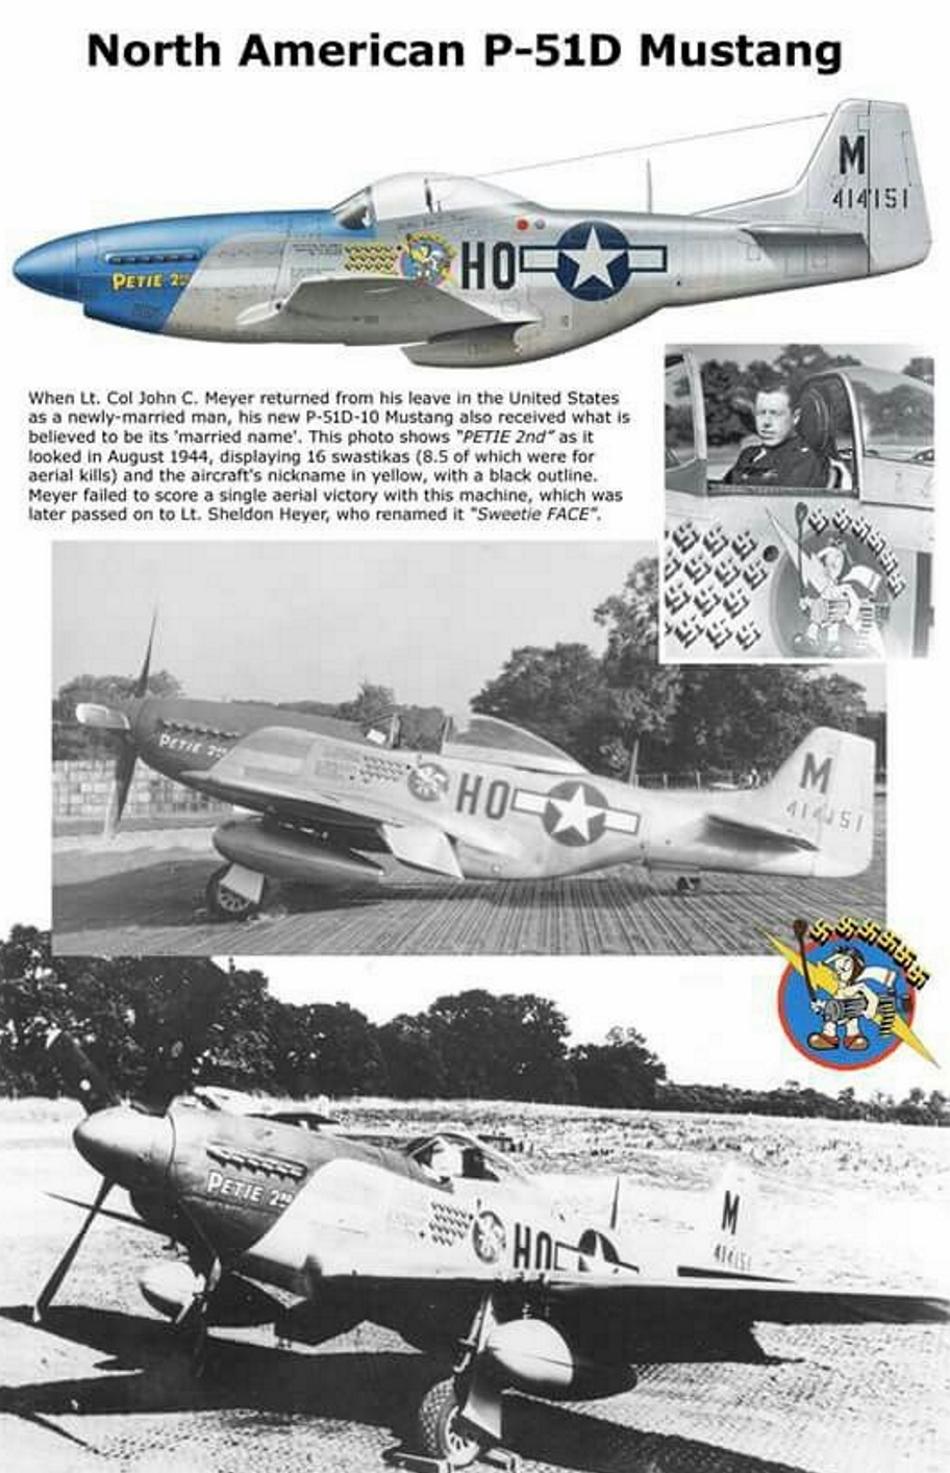 NORTH AMERICAN P-51 MUSTANG P51d-117